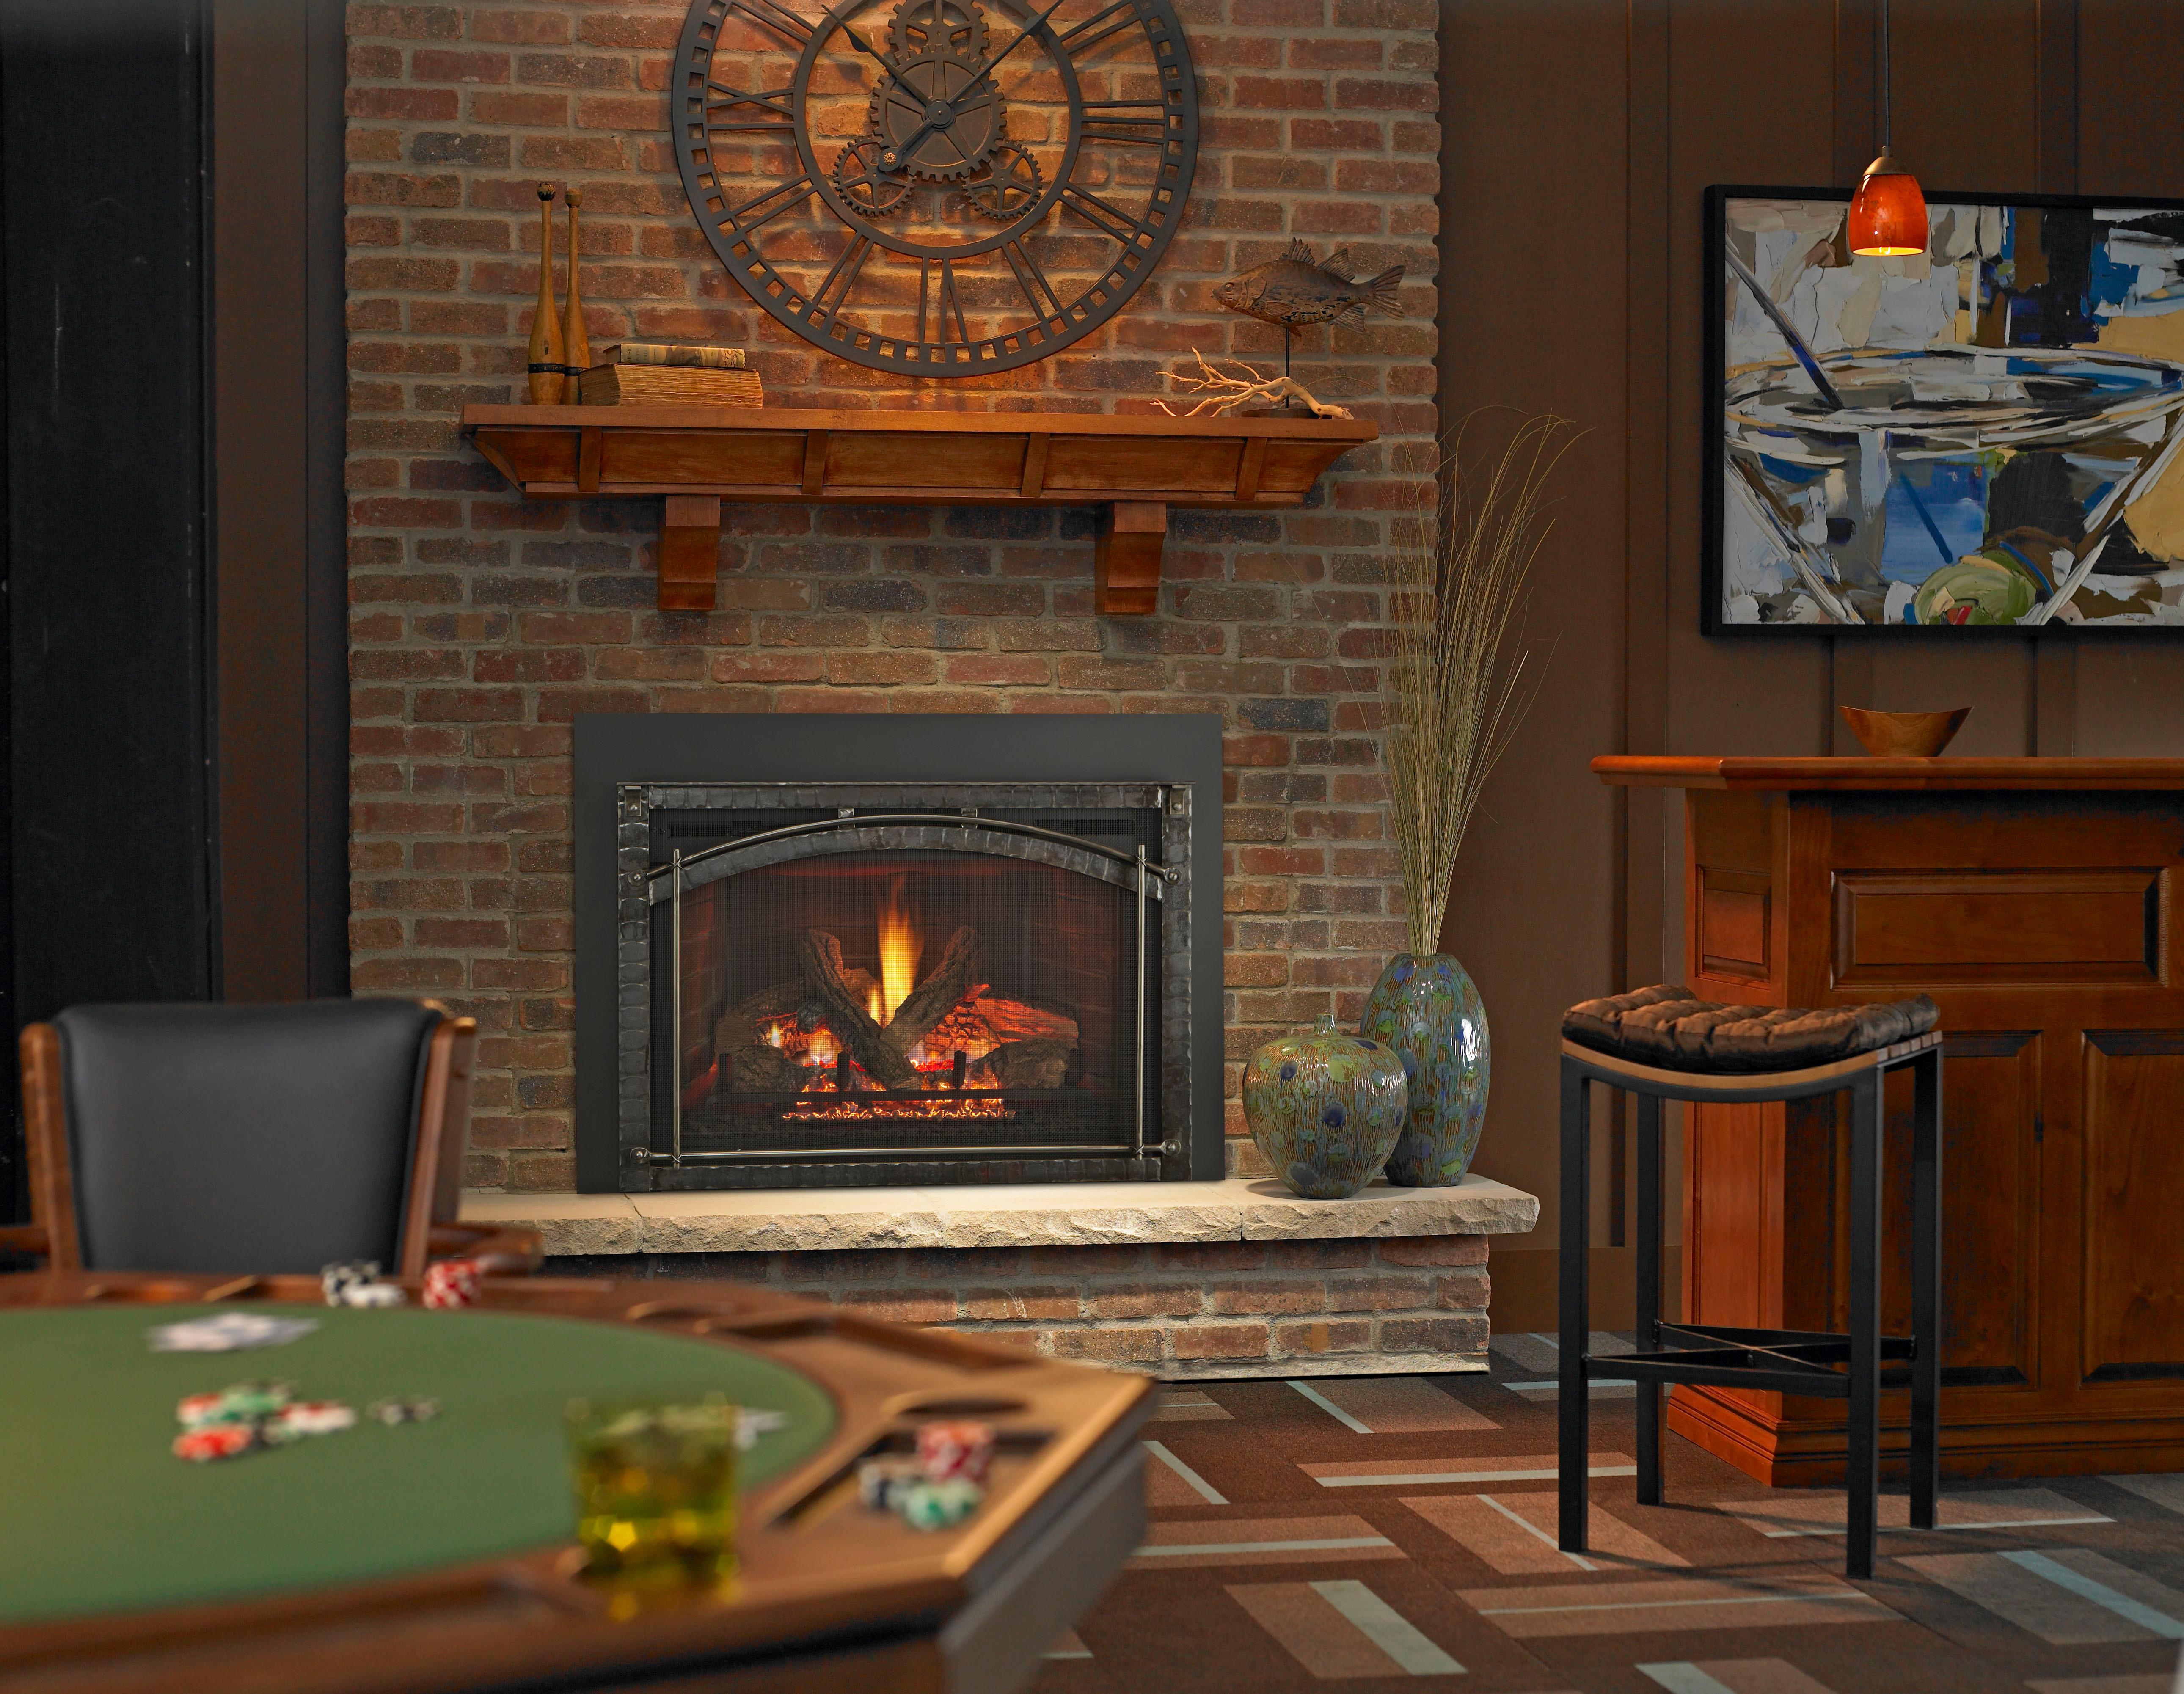 Fireside Hearth & Home image 0